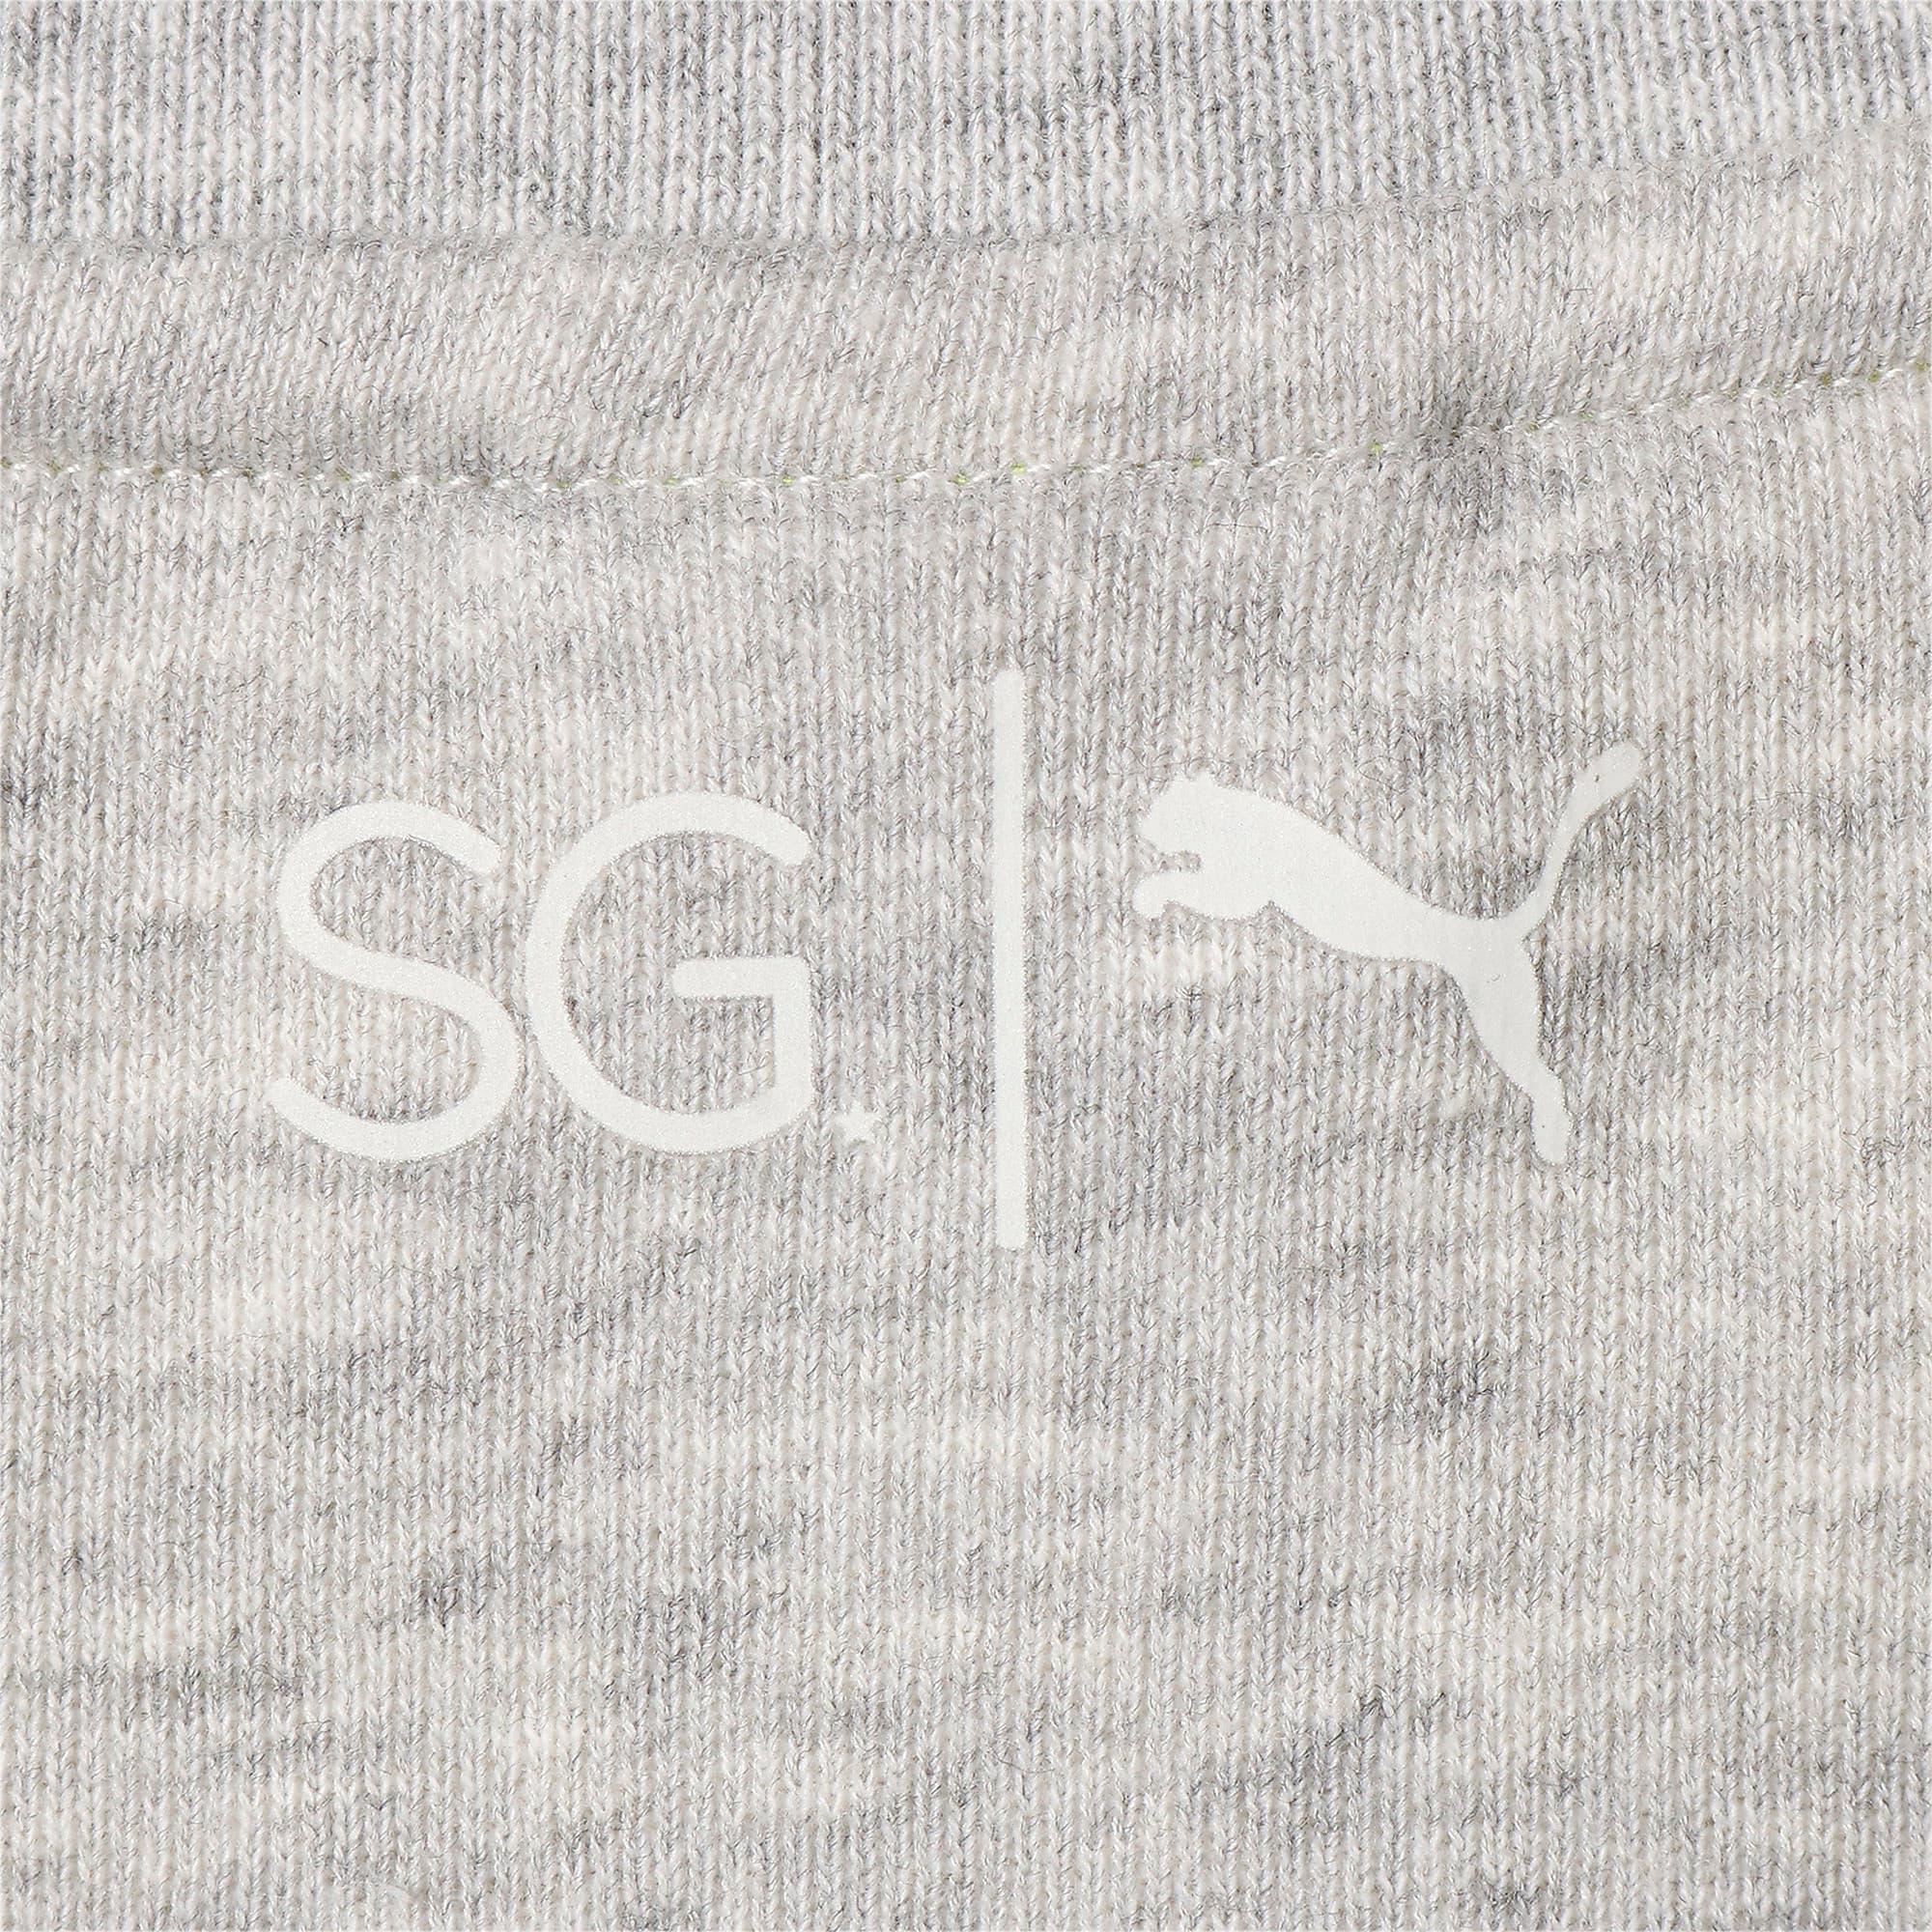 Thumbnail 11 of SG x PUMA ウィメンズ スウェットシャツ, Light Gray Heather, medium-JPN